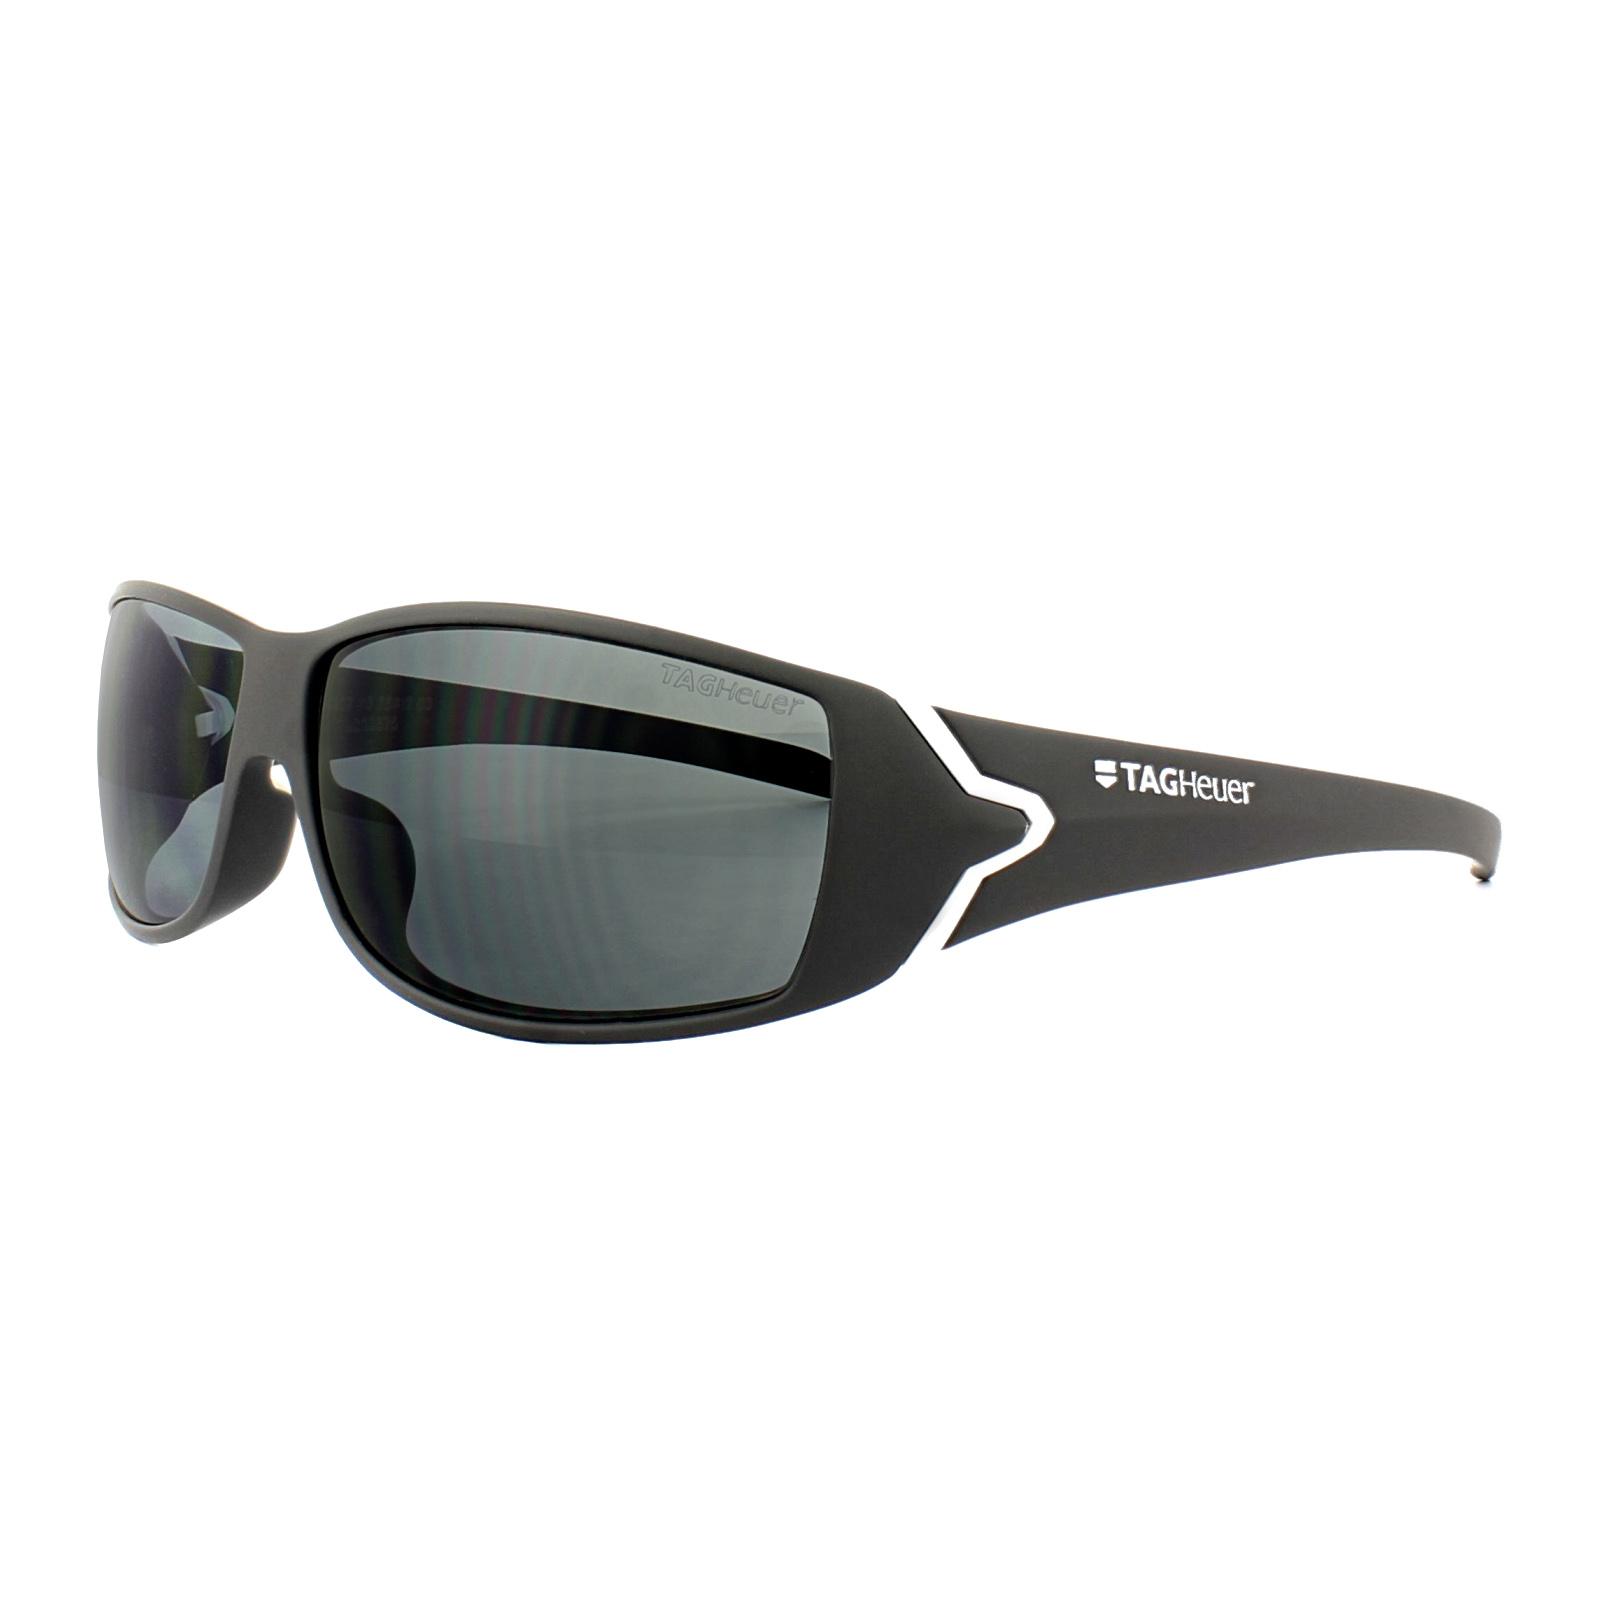 d44061b47b Sentinel Tag Heuer Sunglasses Racer 9207 113 Grey Grey Outdoor